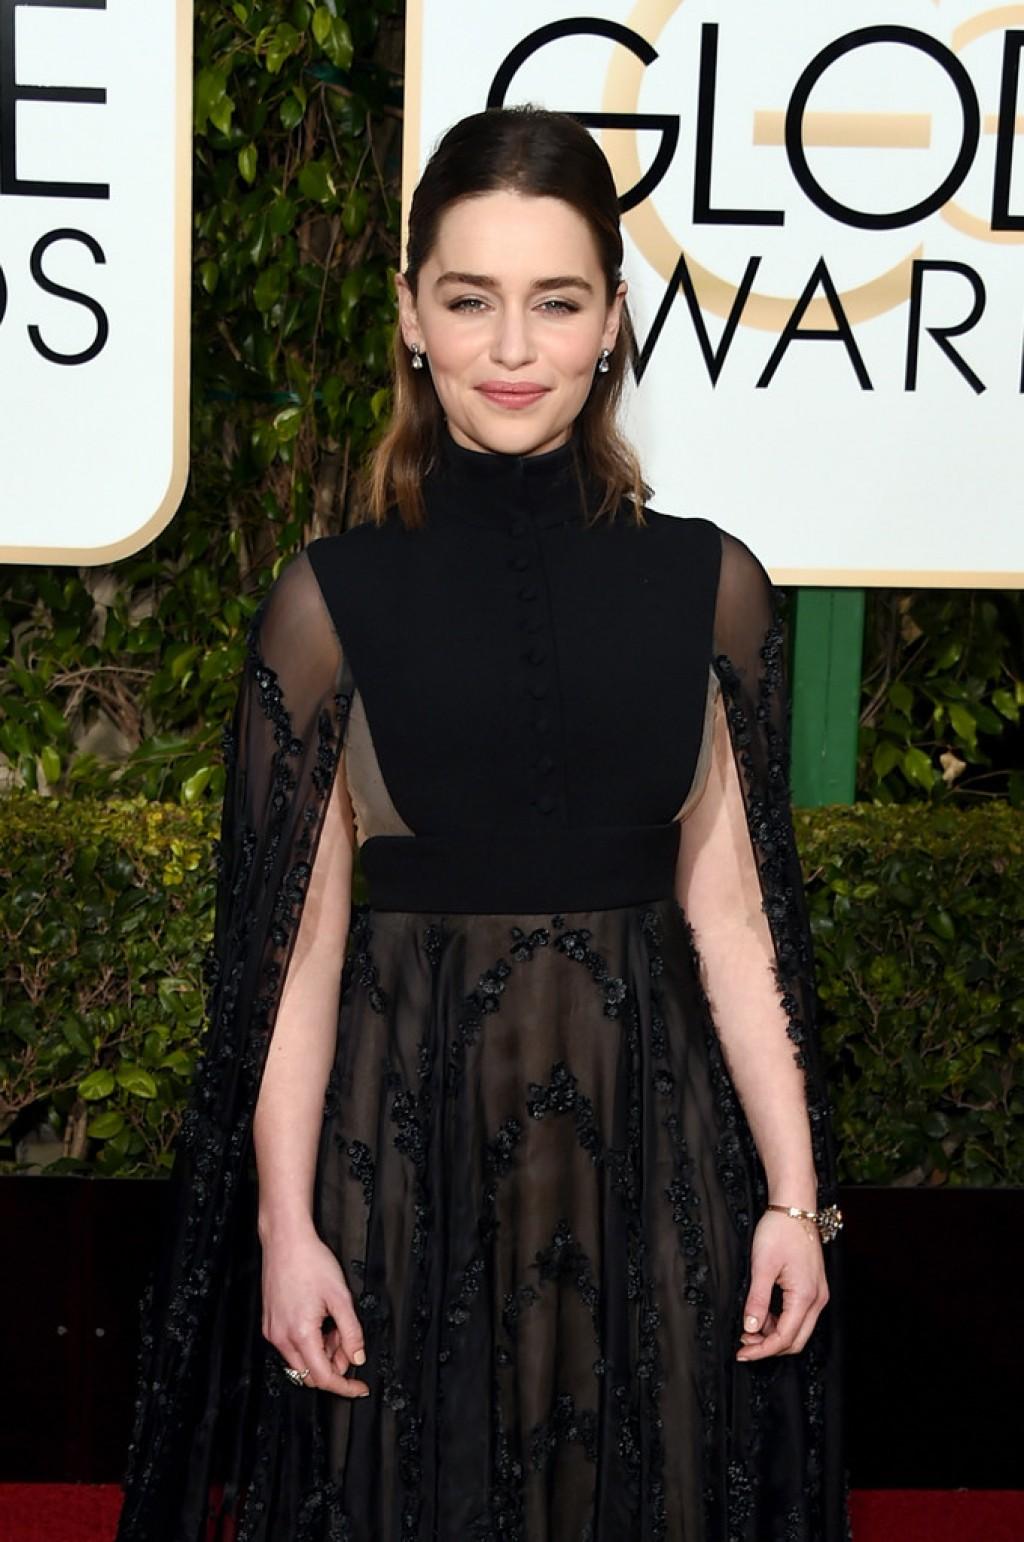 Emilia-Clarke-2016-Golden-Globes-Valentino-a-1024x1542